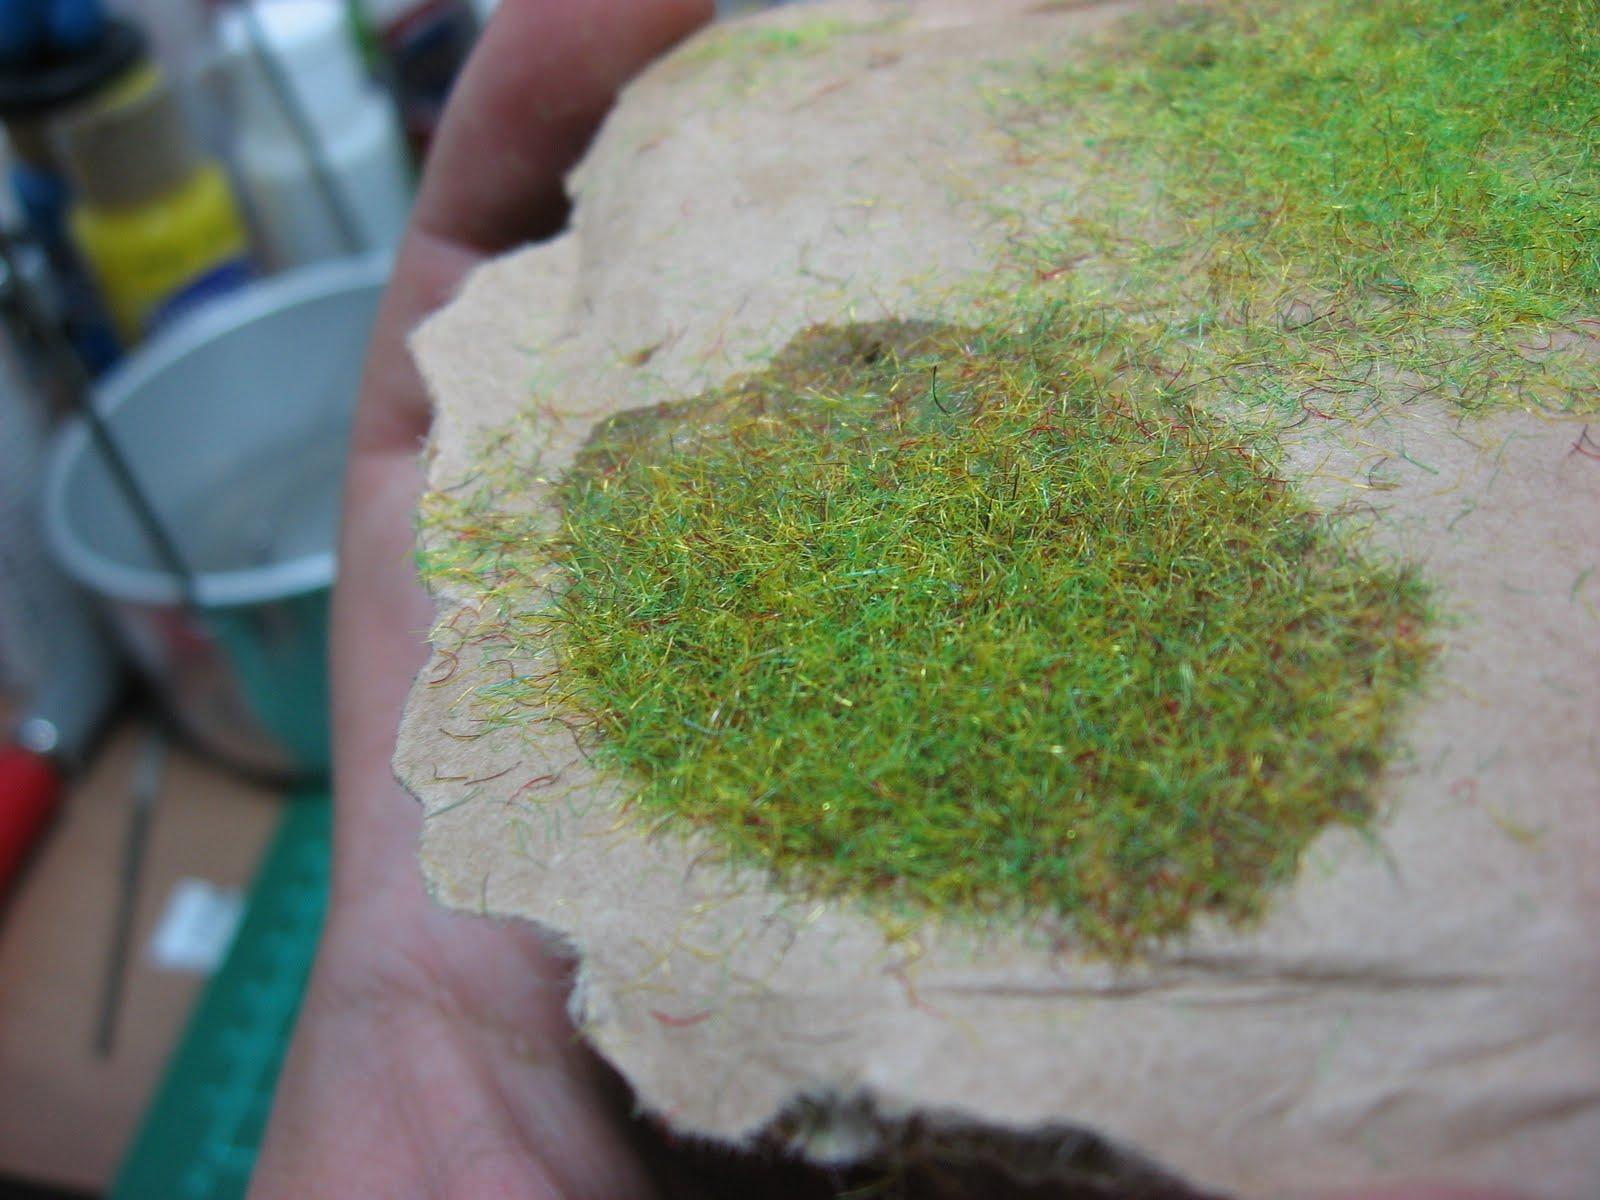 Adary's scrapbook: DIY Static grass applicator for under $15